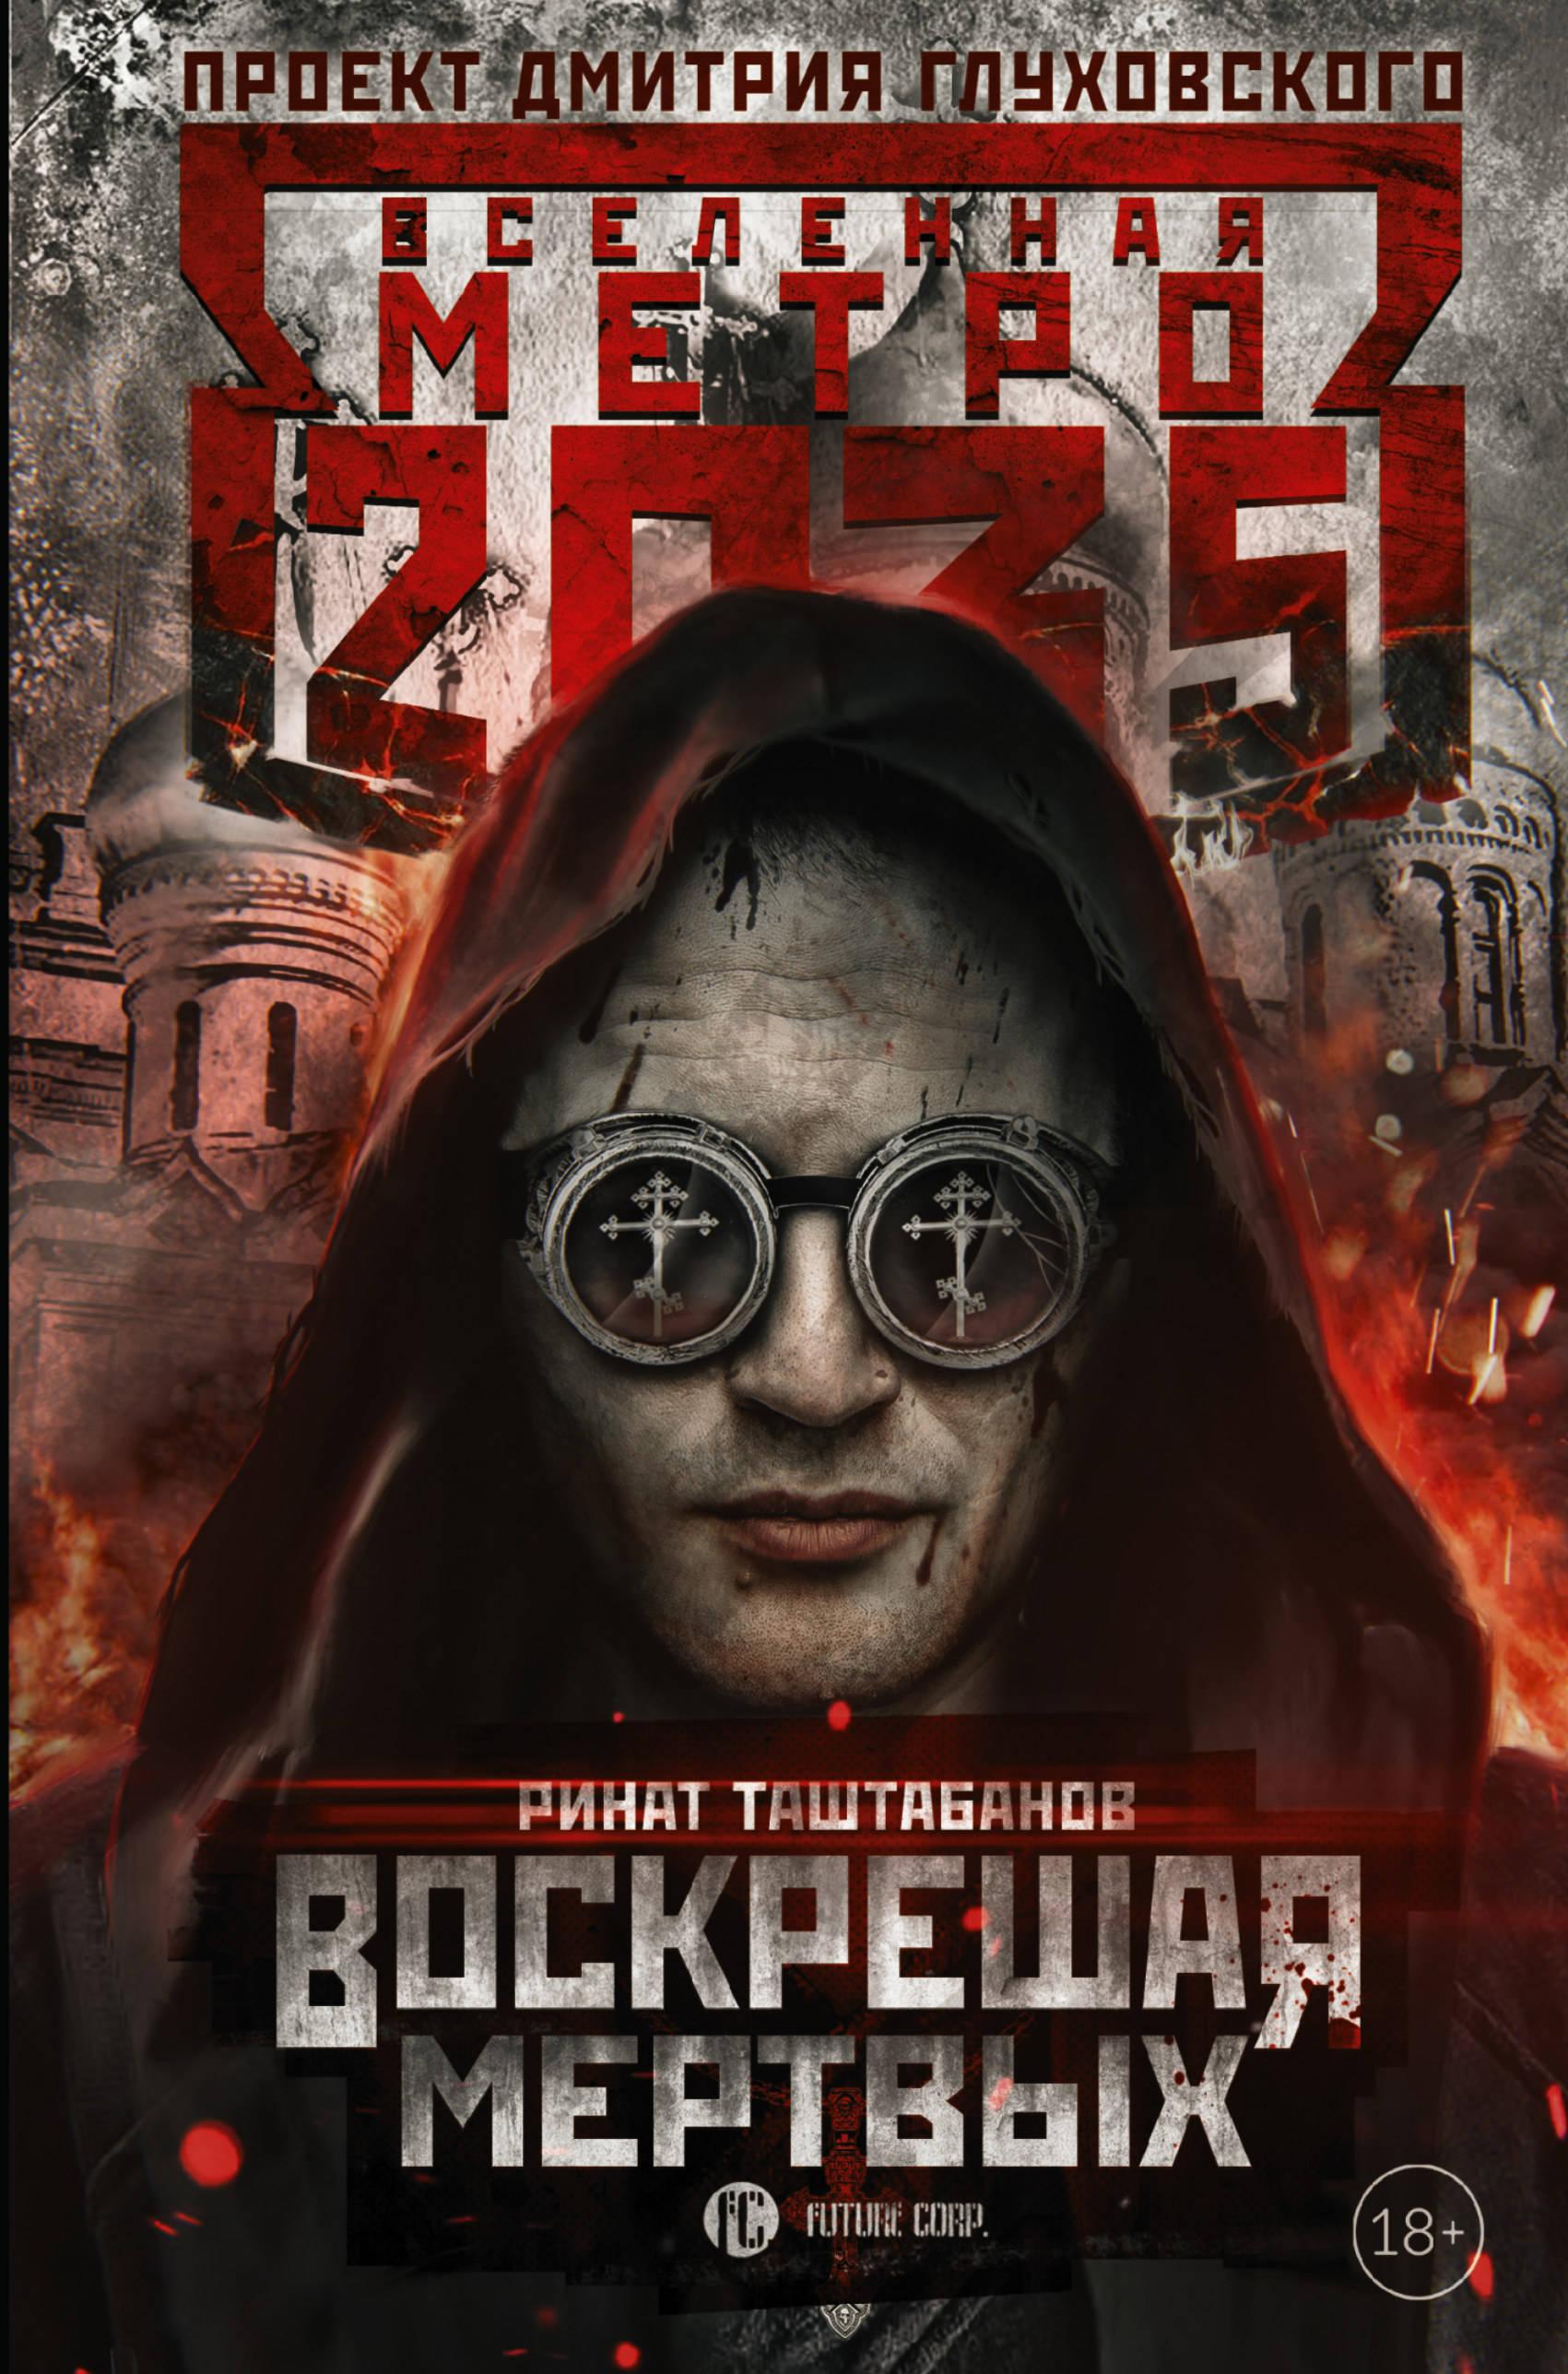 Ринат Таштабано Метро 2035: оскрешая мертых